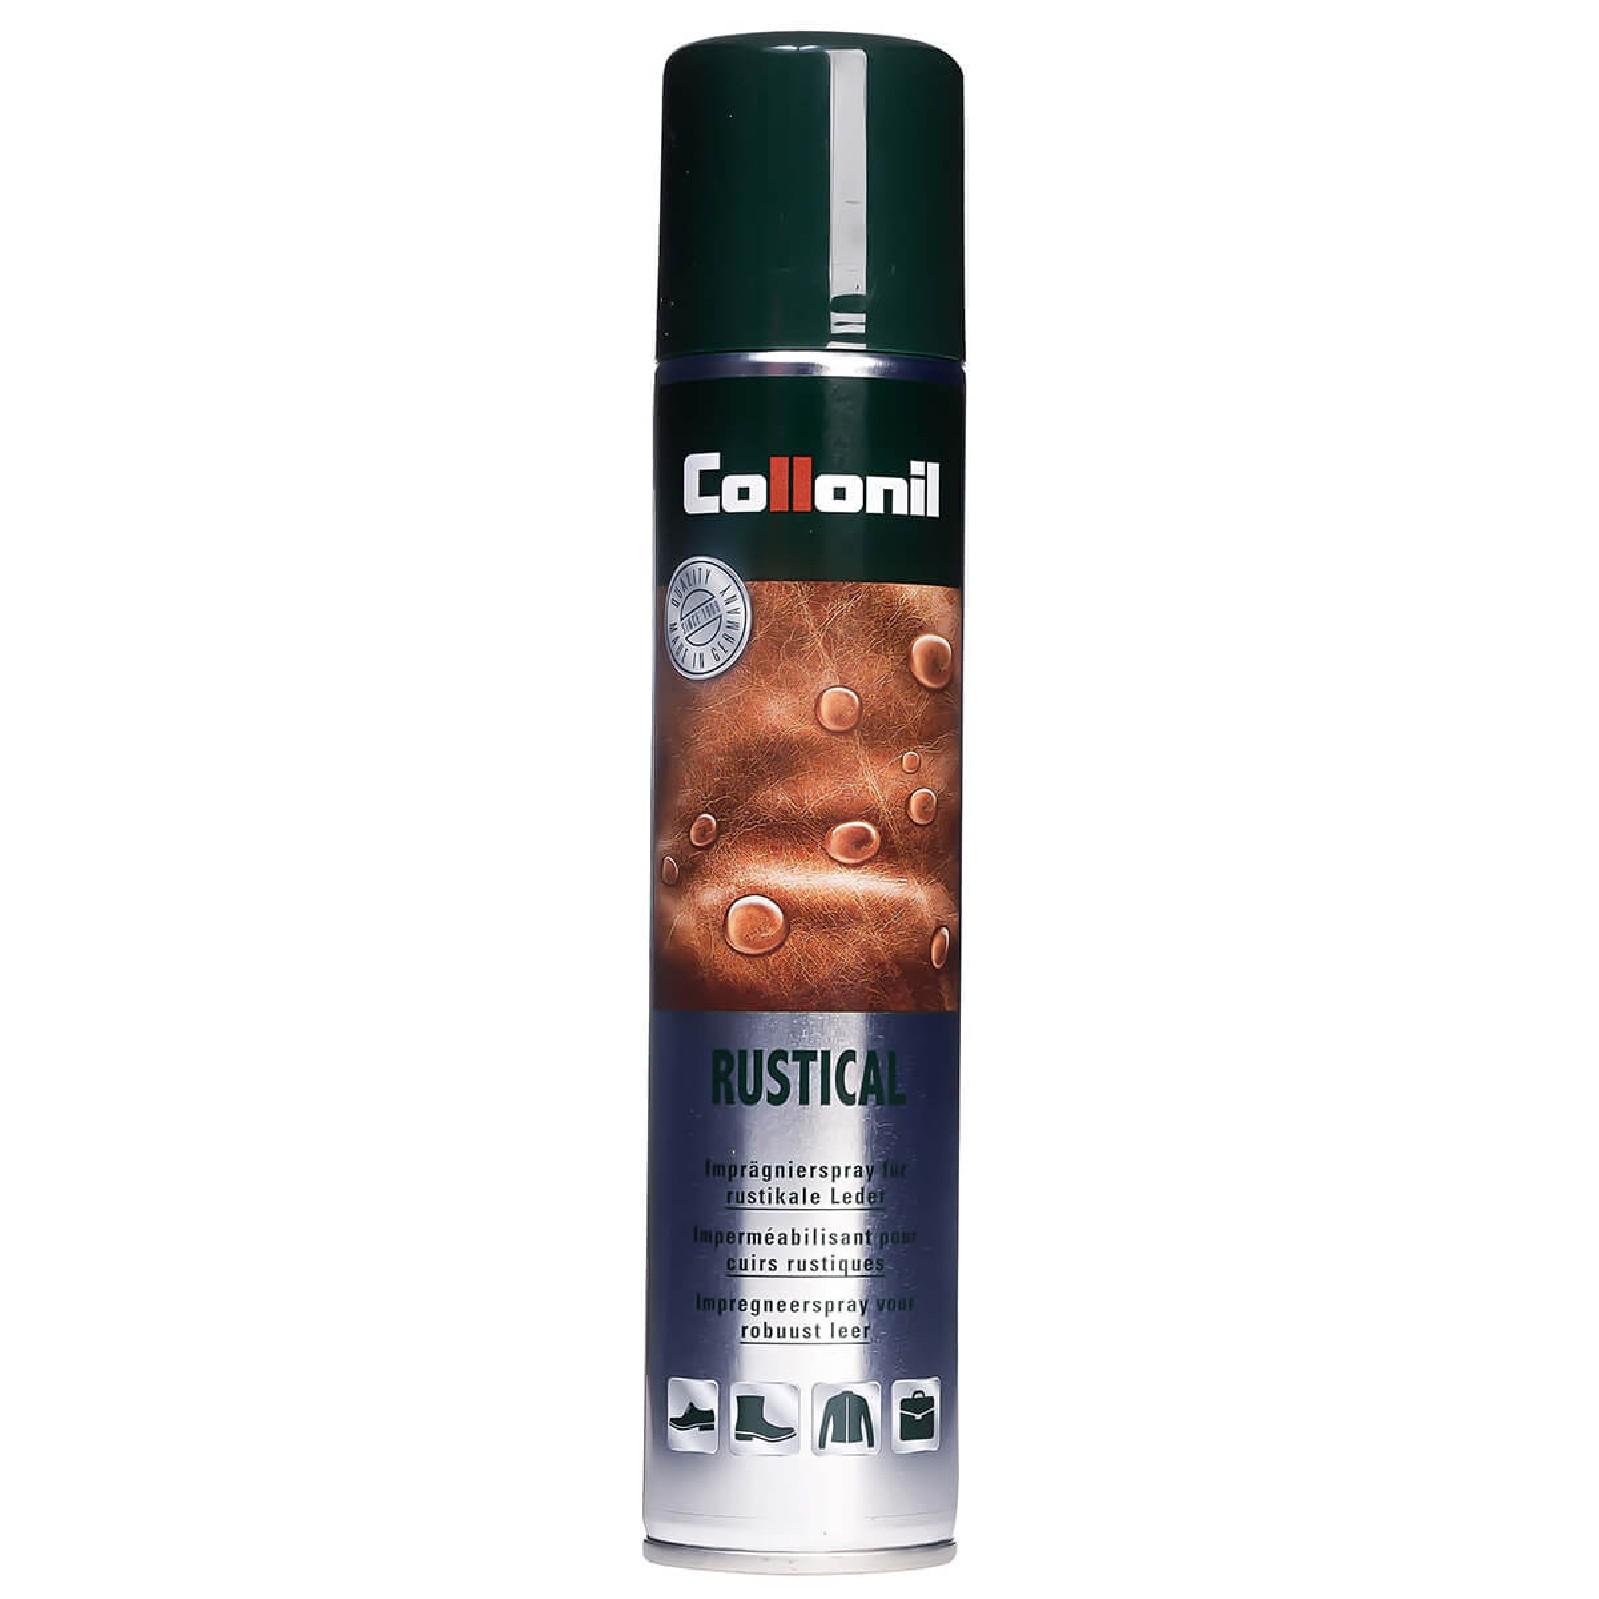 Collonil Rustical 200 ml